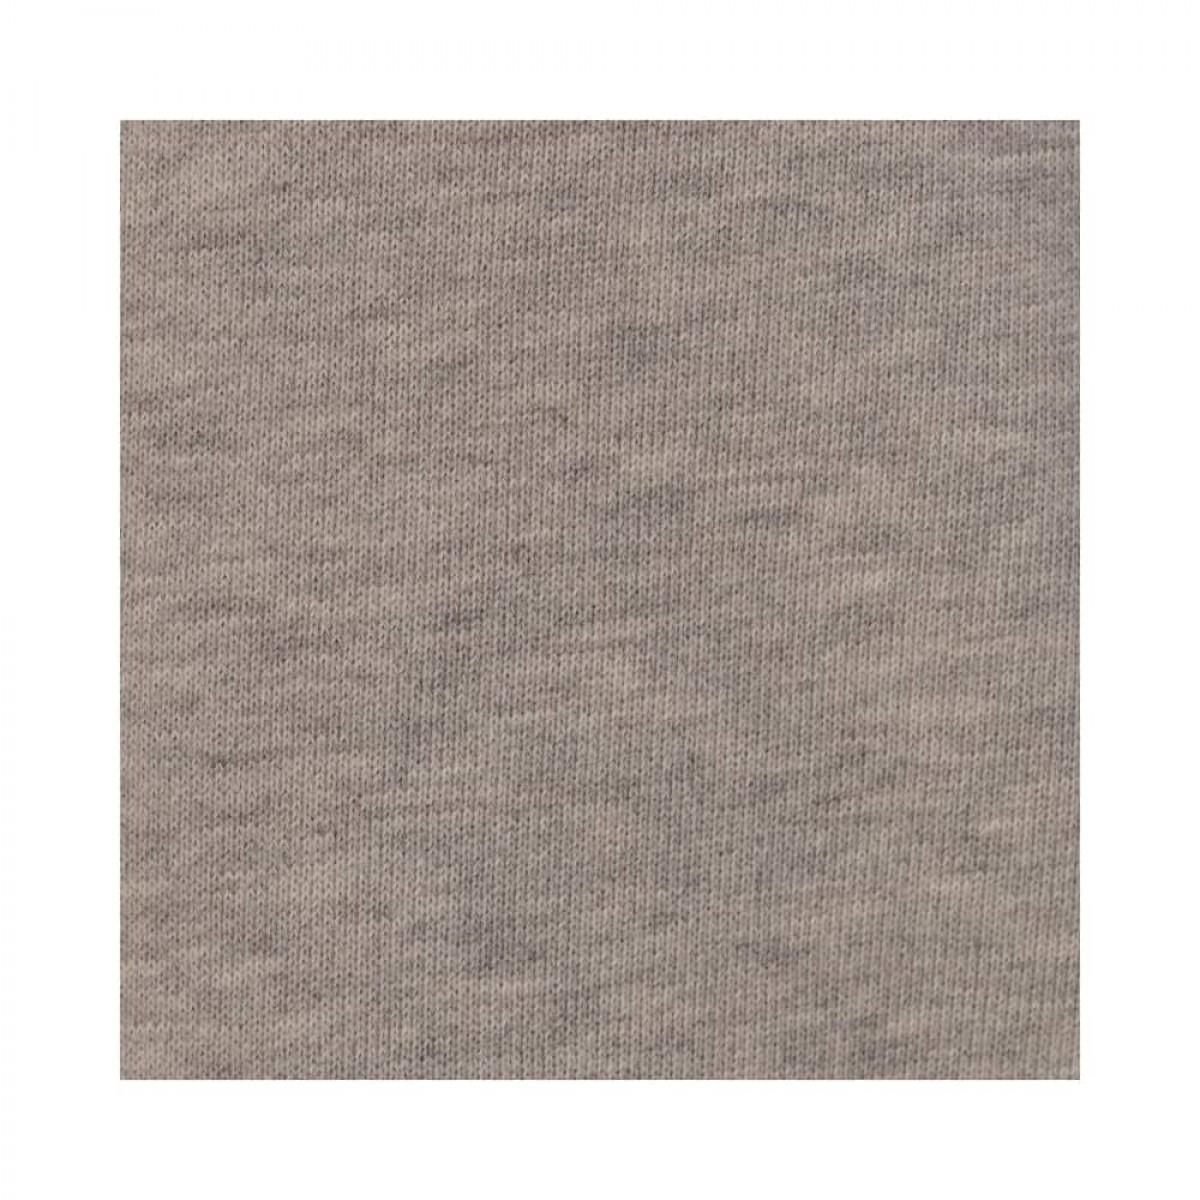 phine sweatpants - grey melange - kvalitet